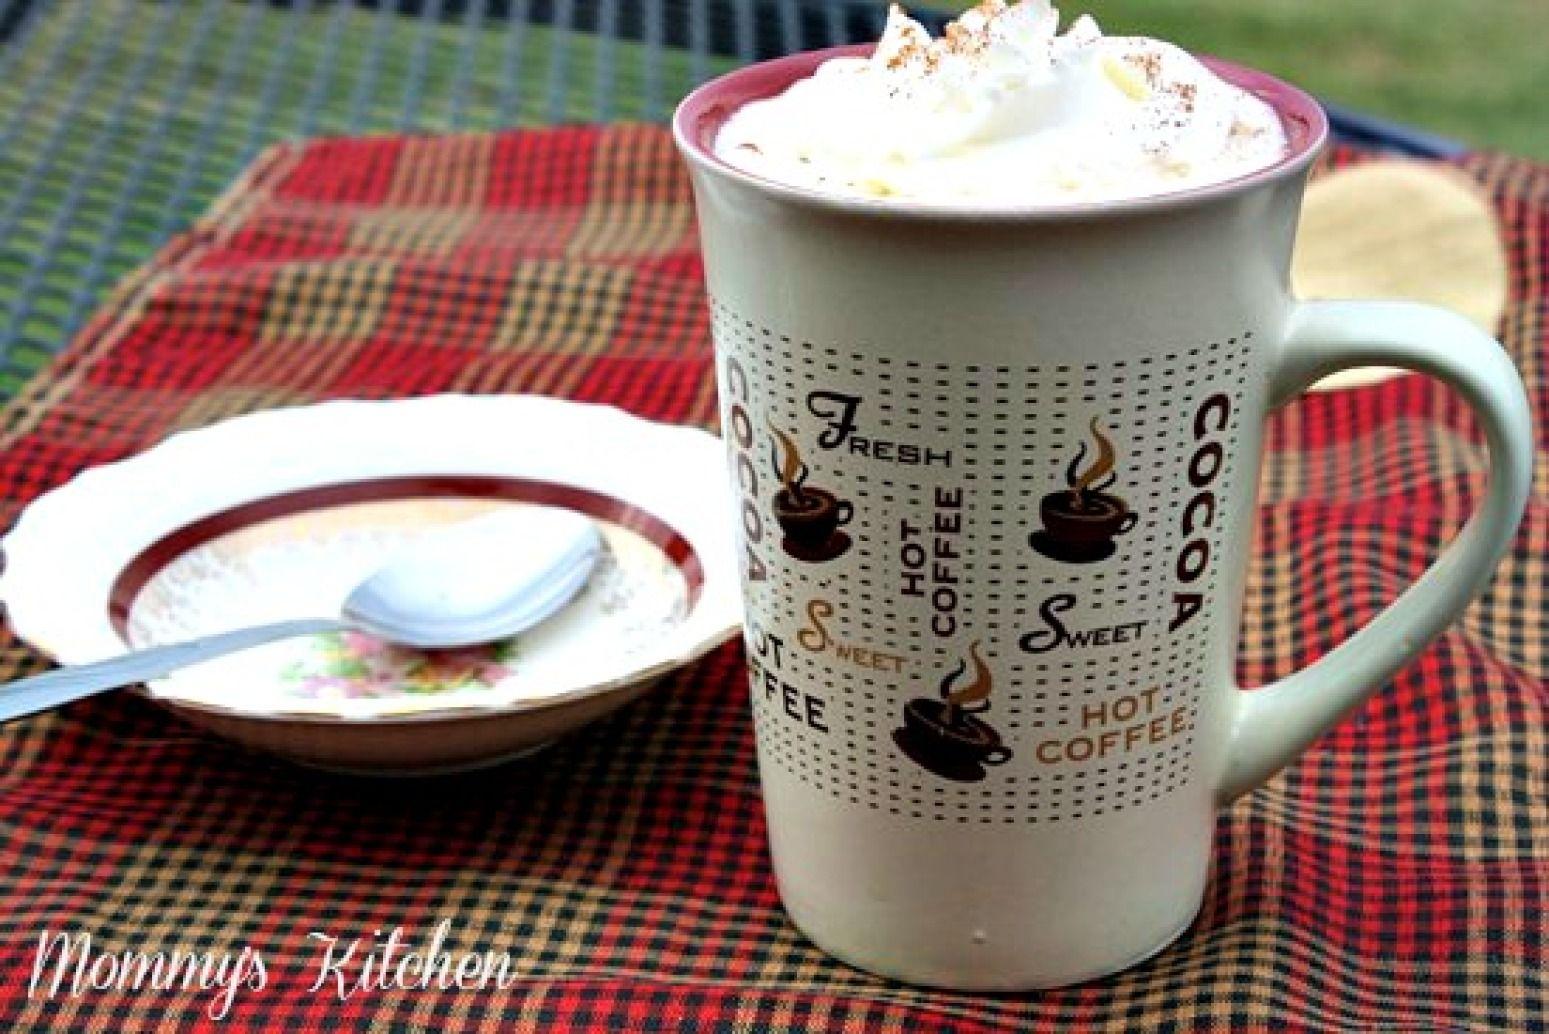 Copy cat starbucks white chocolate mocha recipe with